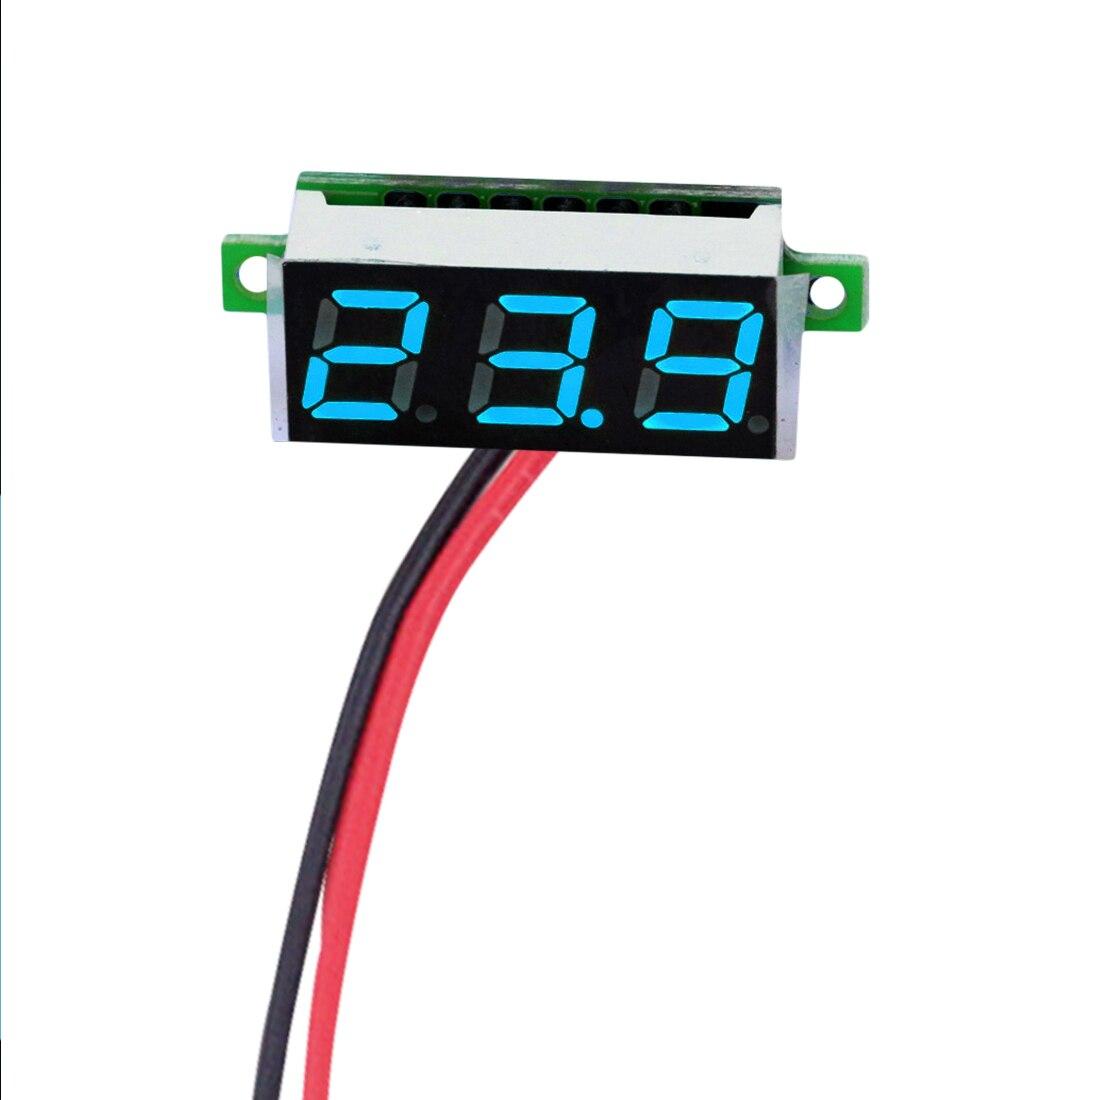 Voltage Tester Meter  1PC 0.28 Inch 2.5V-30V Mini Digital Voltmeter LED Screen Digital Voltmeter Electronic Parts Accessories